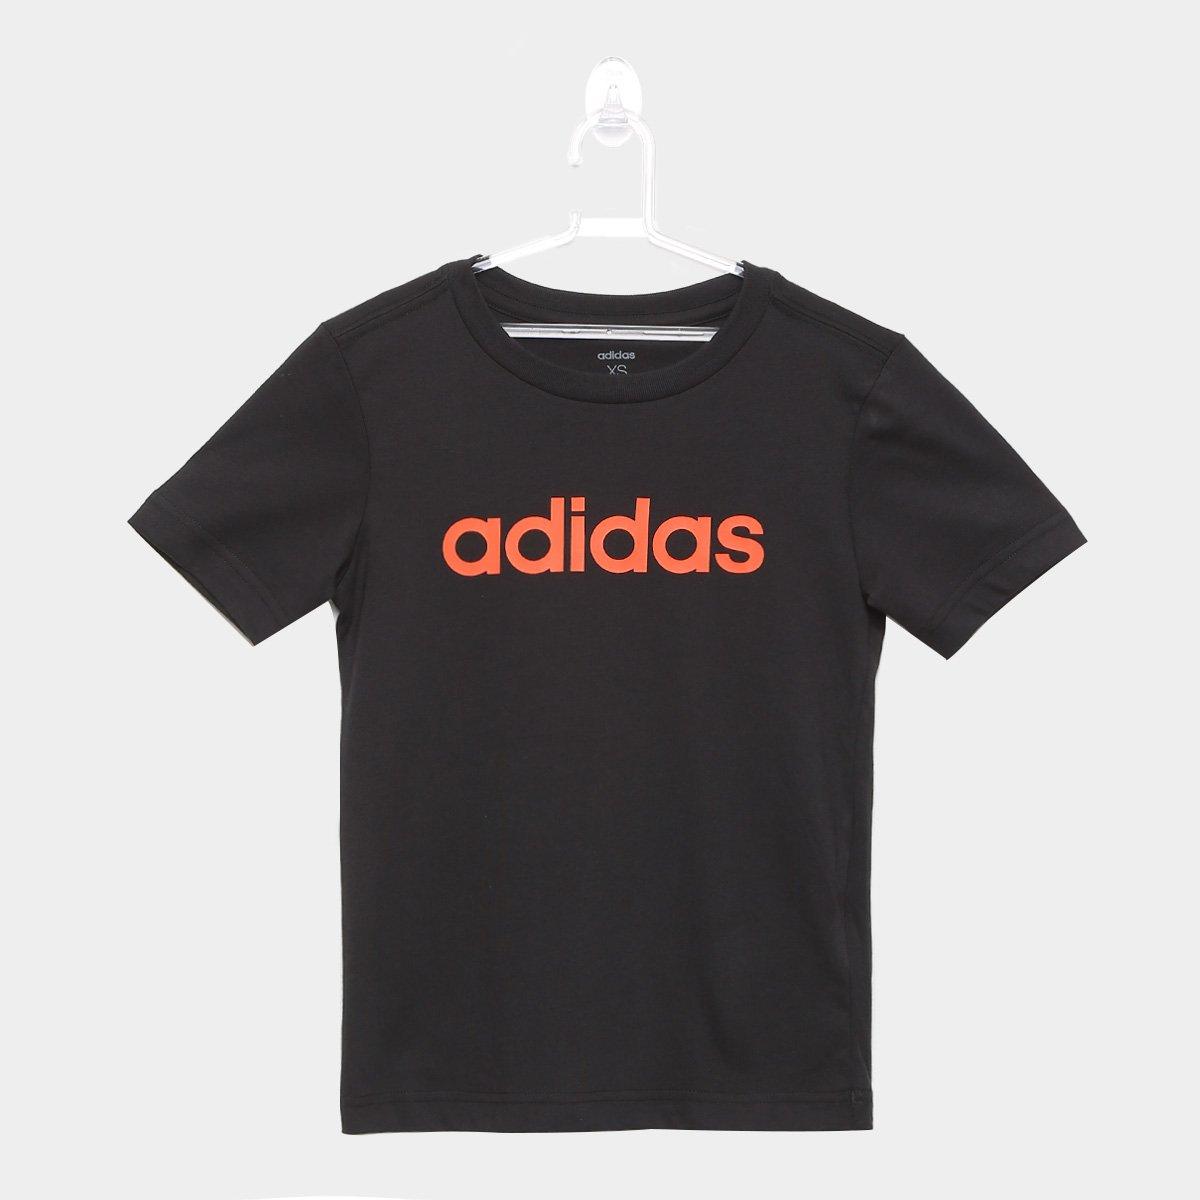 f429570a9d1ab Camiseta Infantil Adidas YB LIN TEE Masculina - Preto e Laranja - Compre  Agora